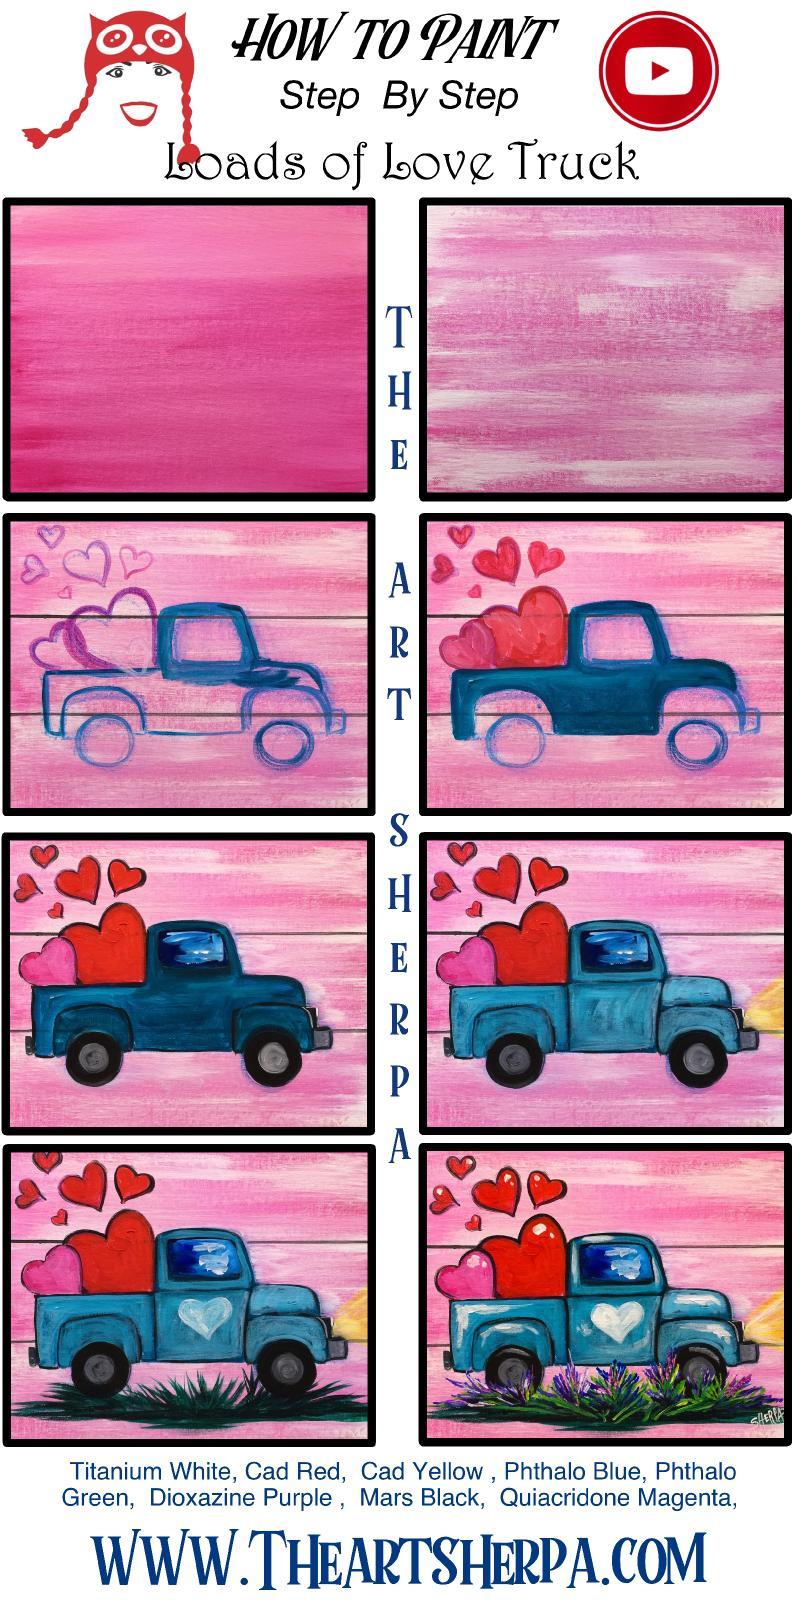 horizontal Step by Step 2020 loads of love truck .jpg